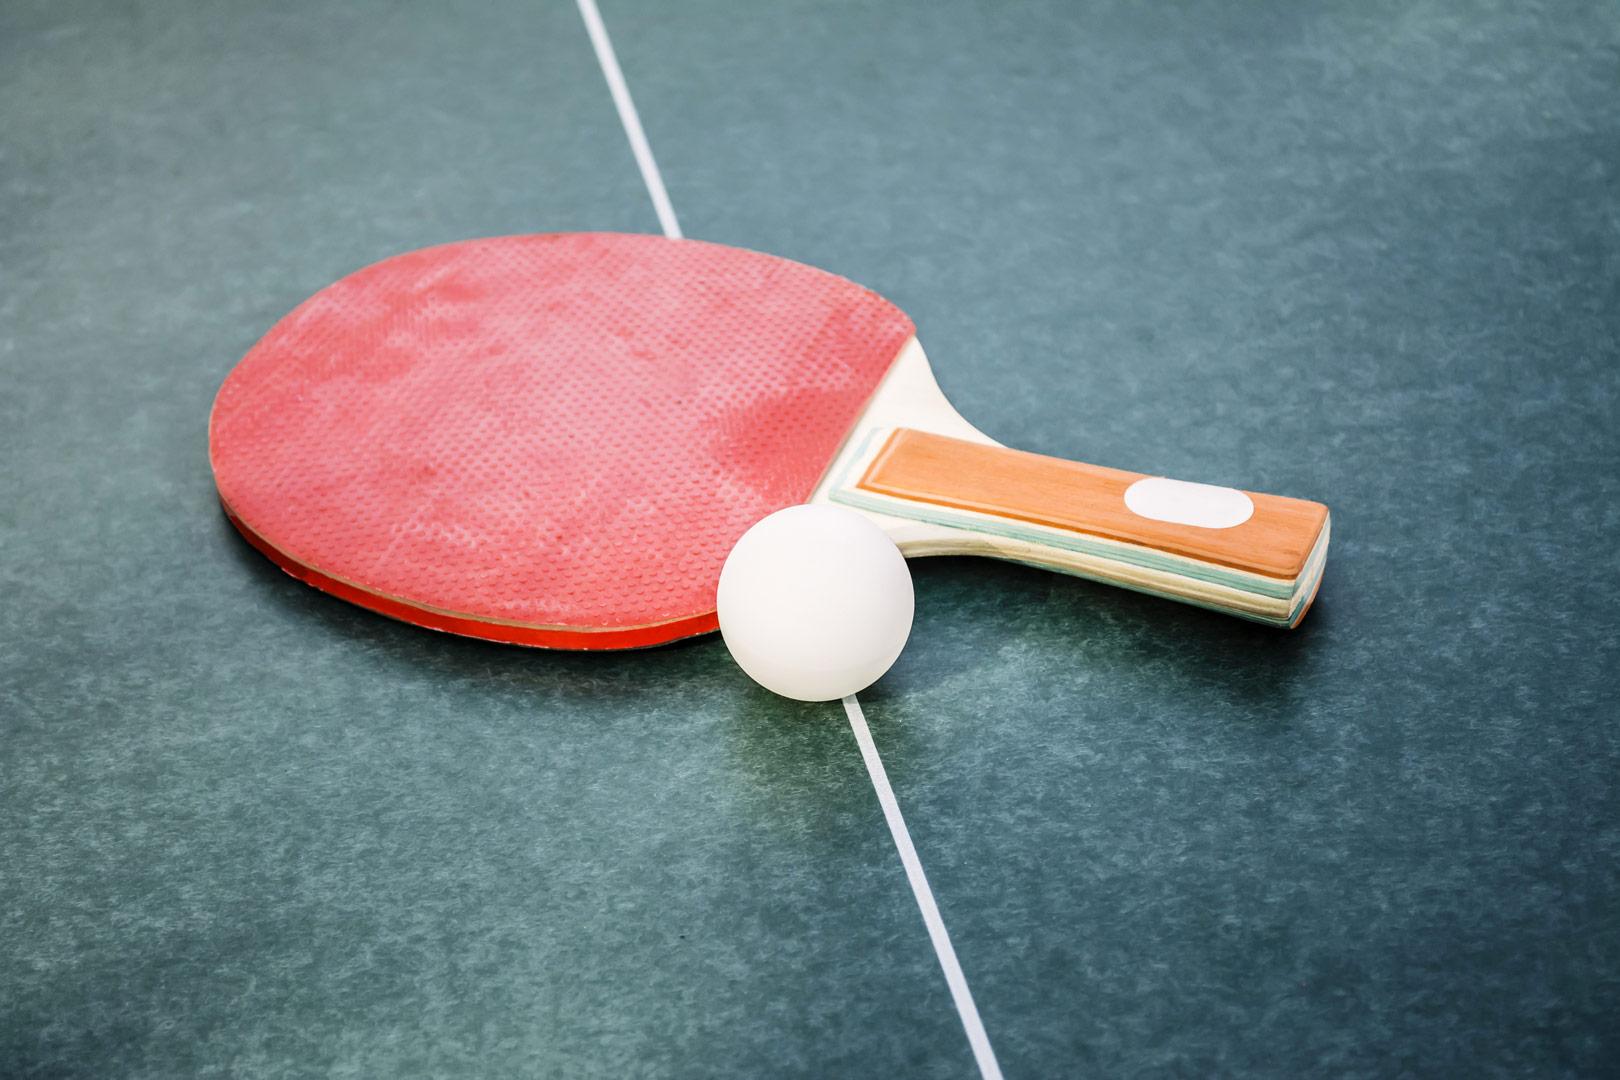 Tennis de table neuilly sur marne - Table tennis de table exterieur ...